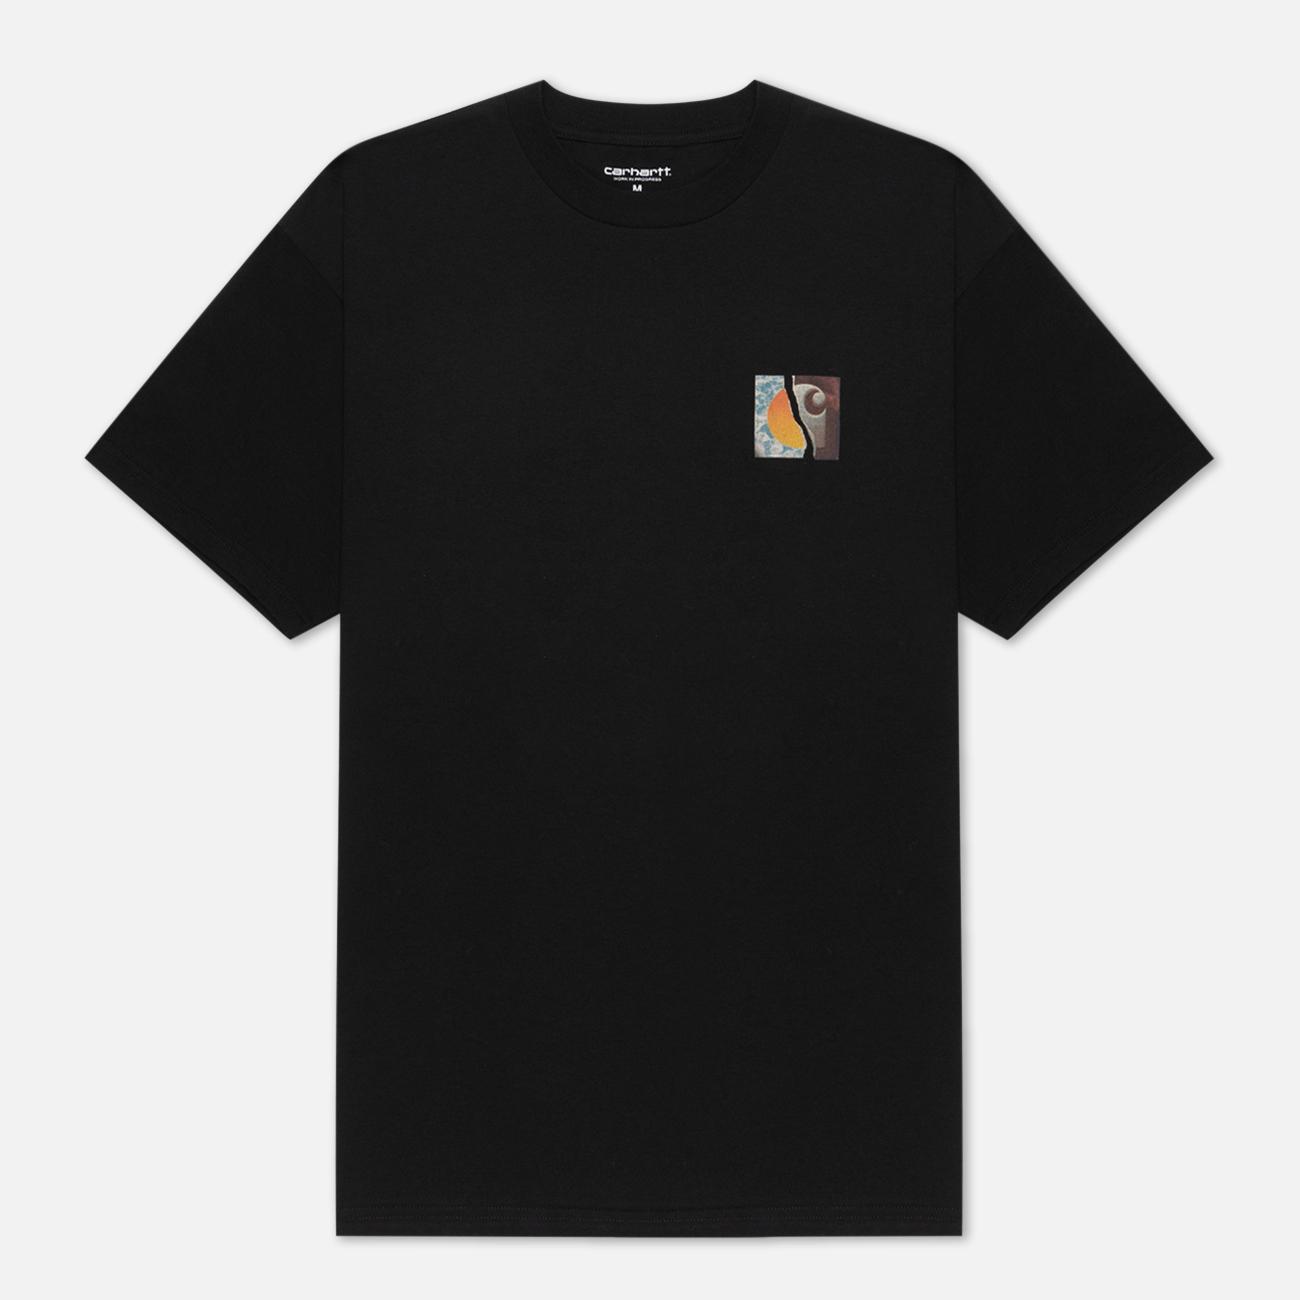 Мужская футболка Carhartt WIP S/S Backpages Black